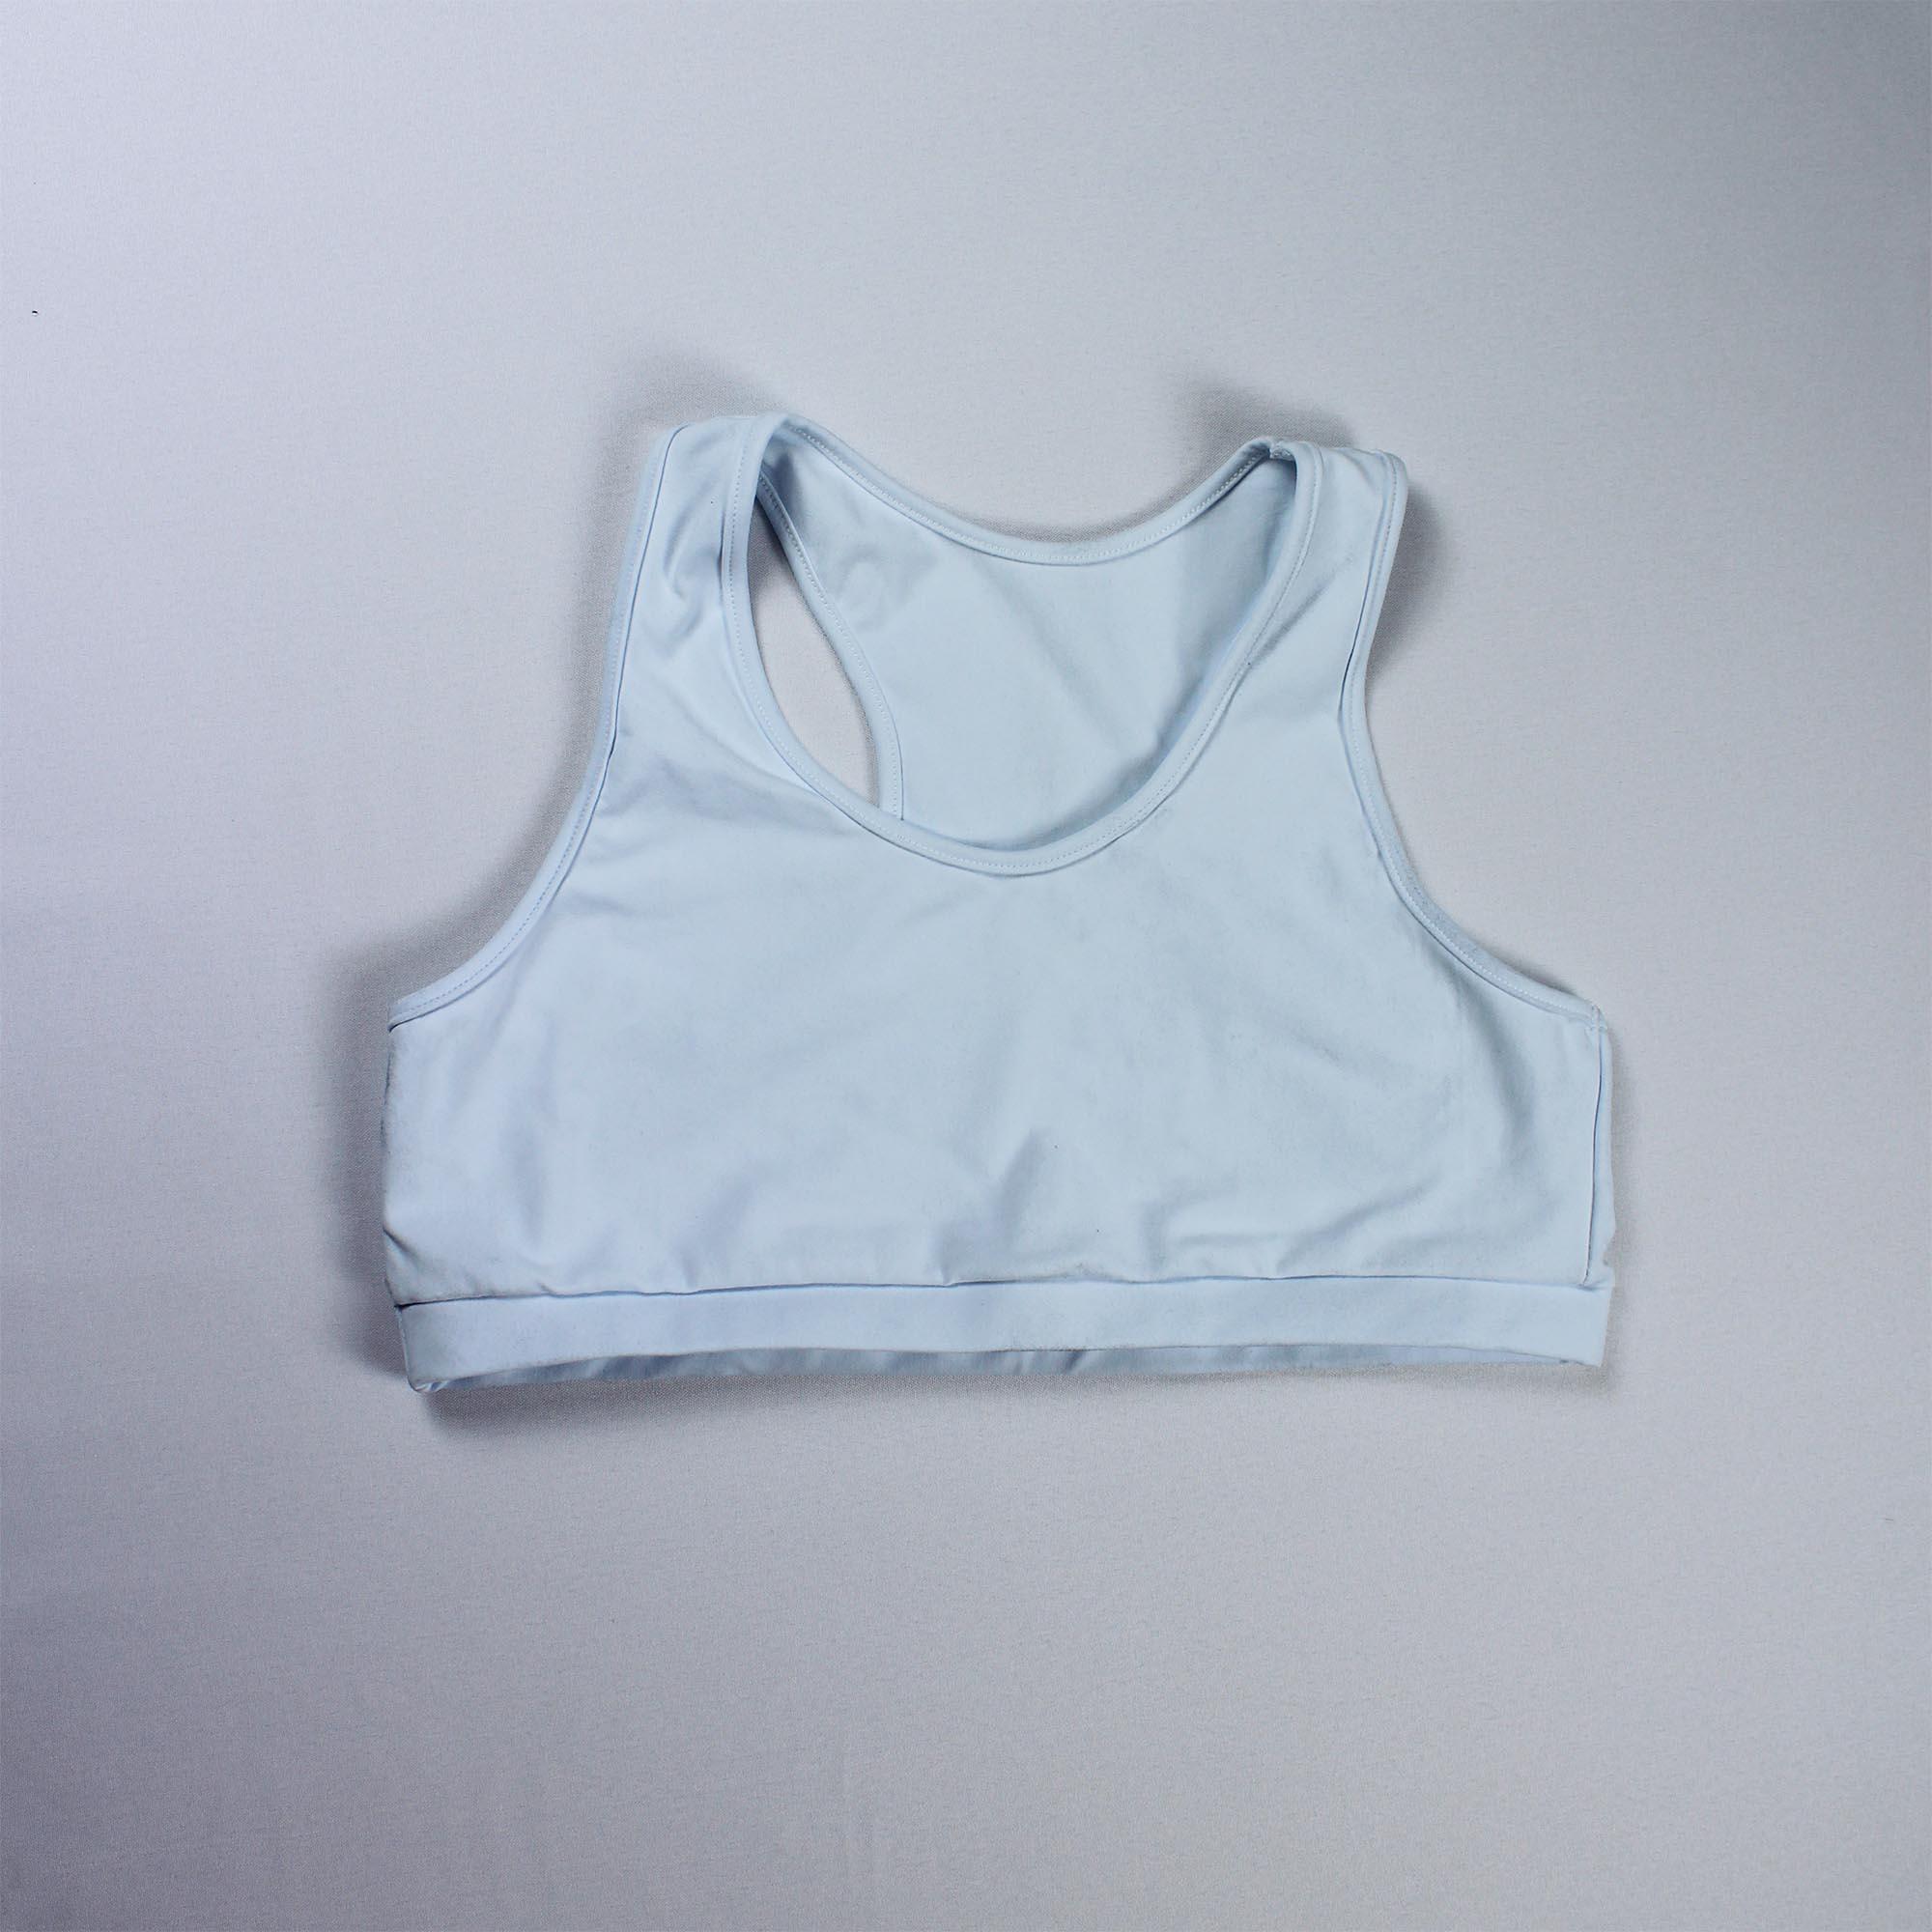 Top Fitness Básico sem Bojo com Tecido Duplo Feminino - Branco